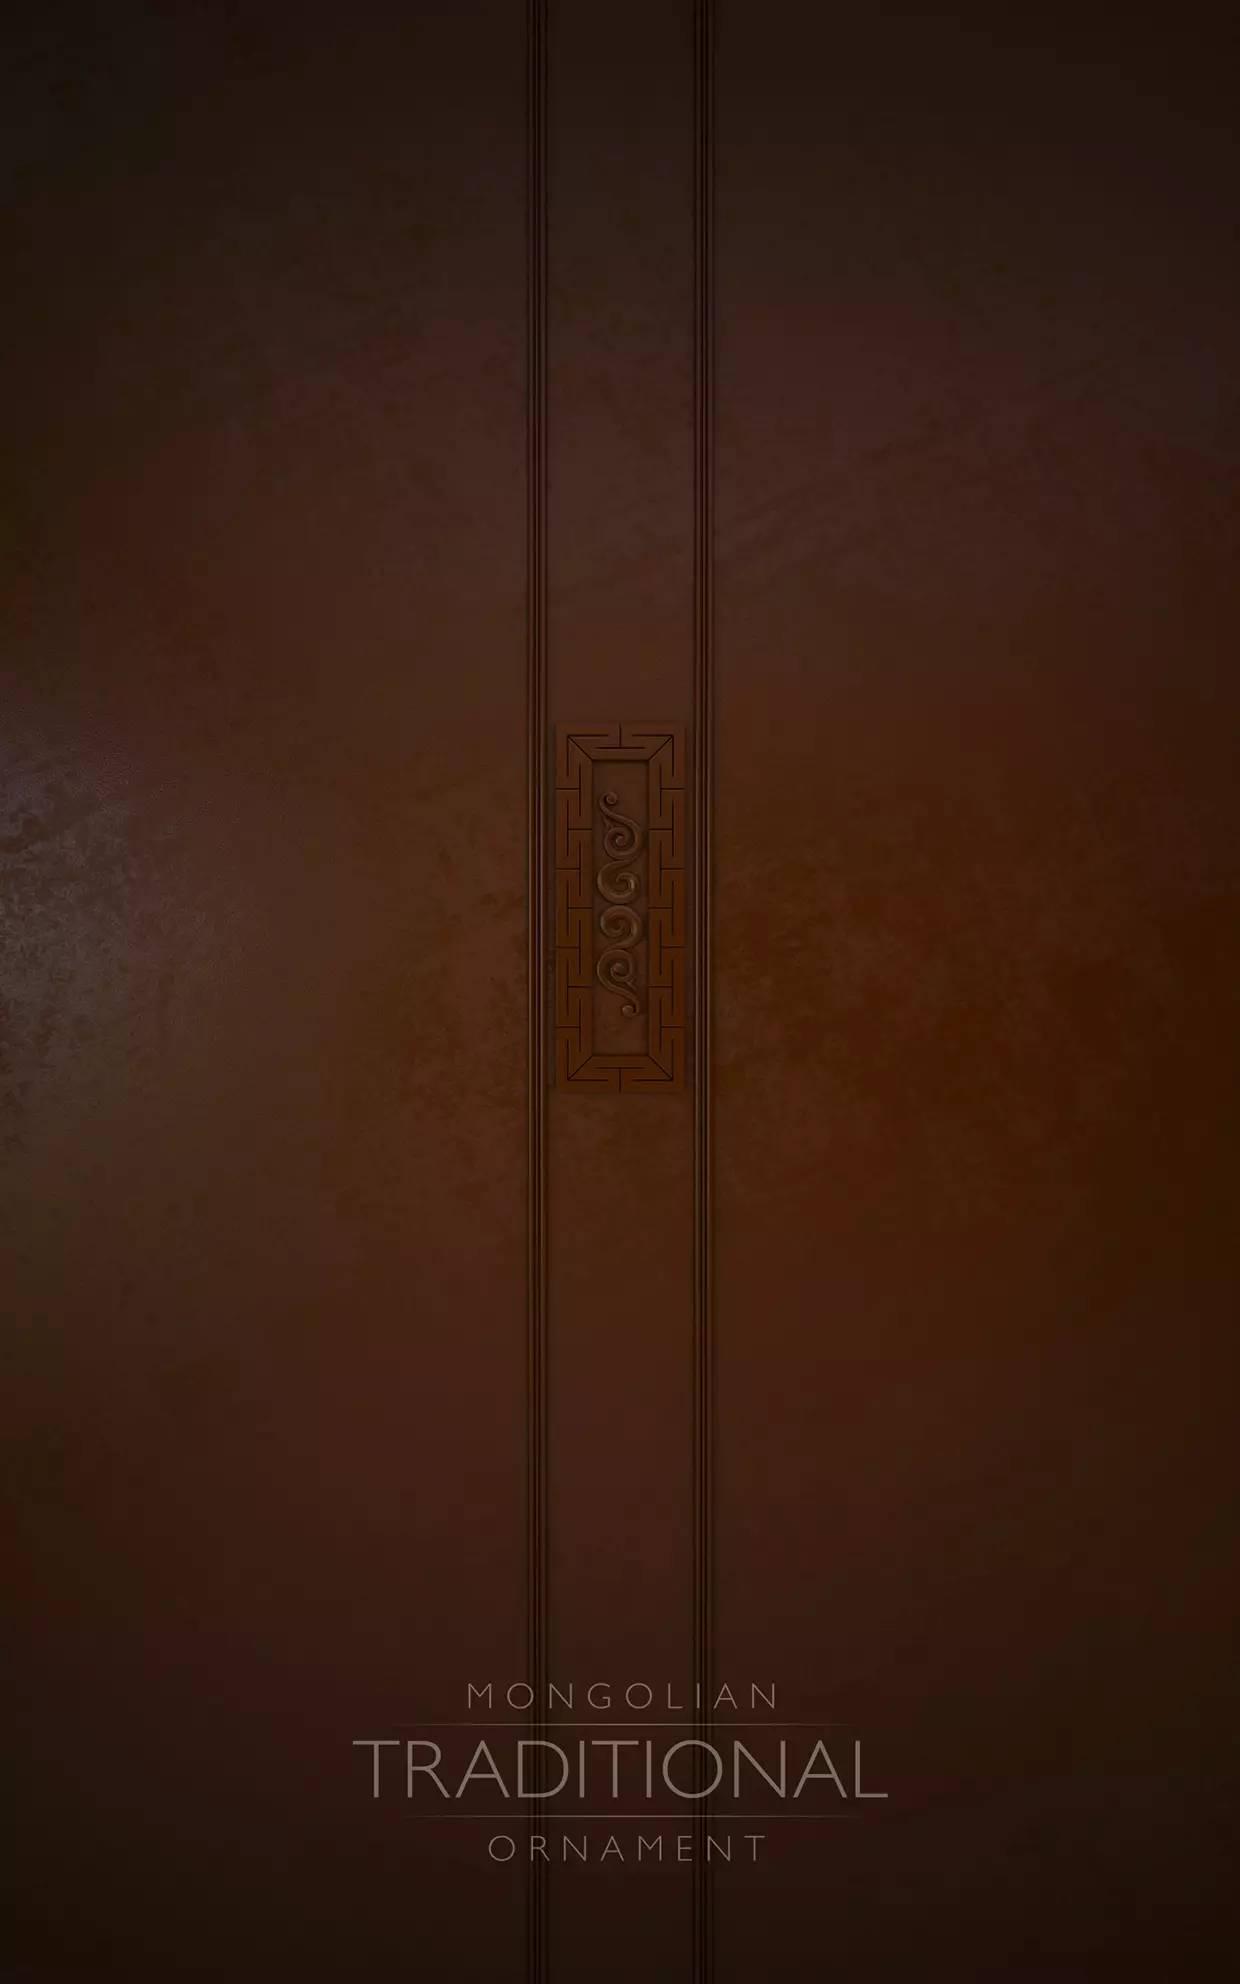 室内设计|蒙族传统装饰(Mongolian Traditional Ornament) 第10张